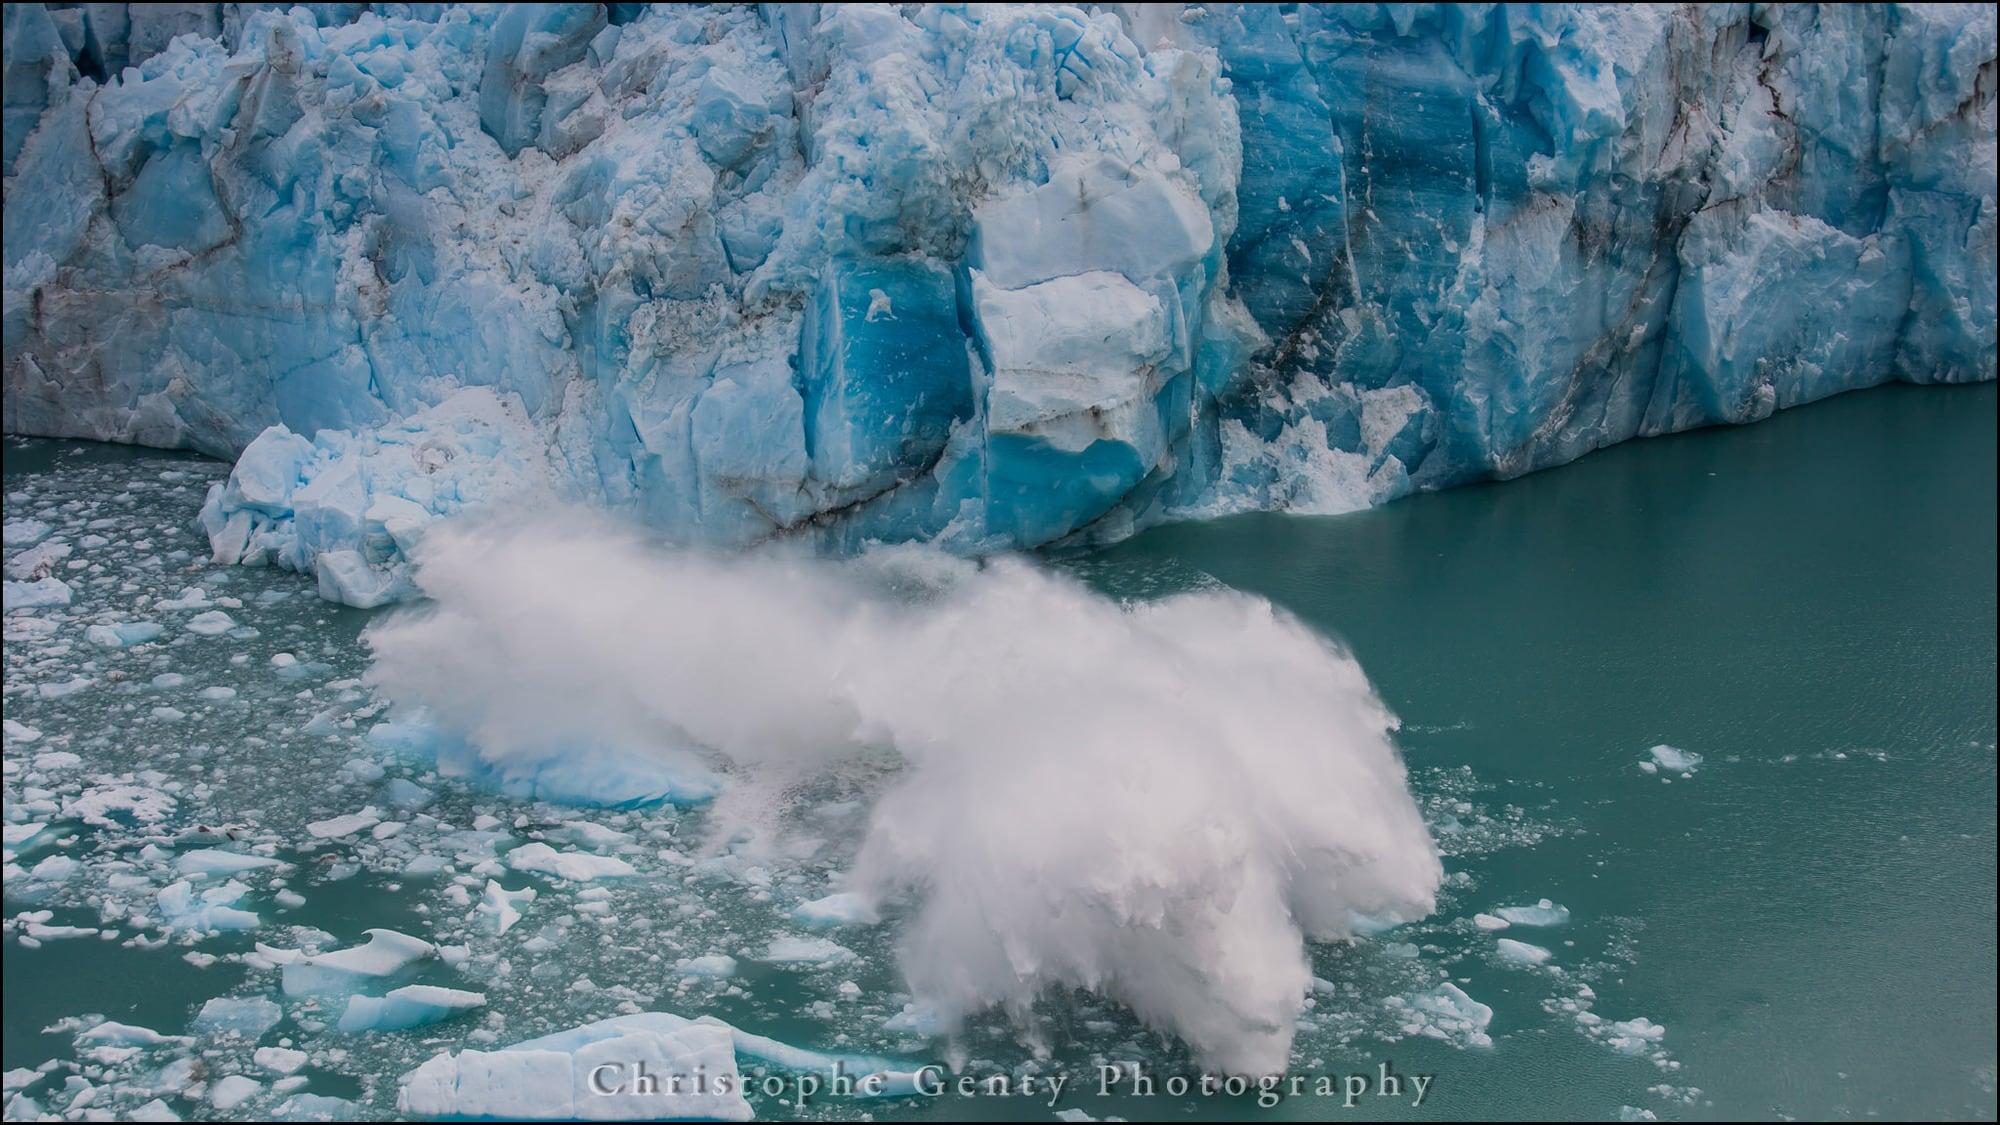 Glacier calving Perito Moreno National Park, Argentina - December 2015